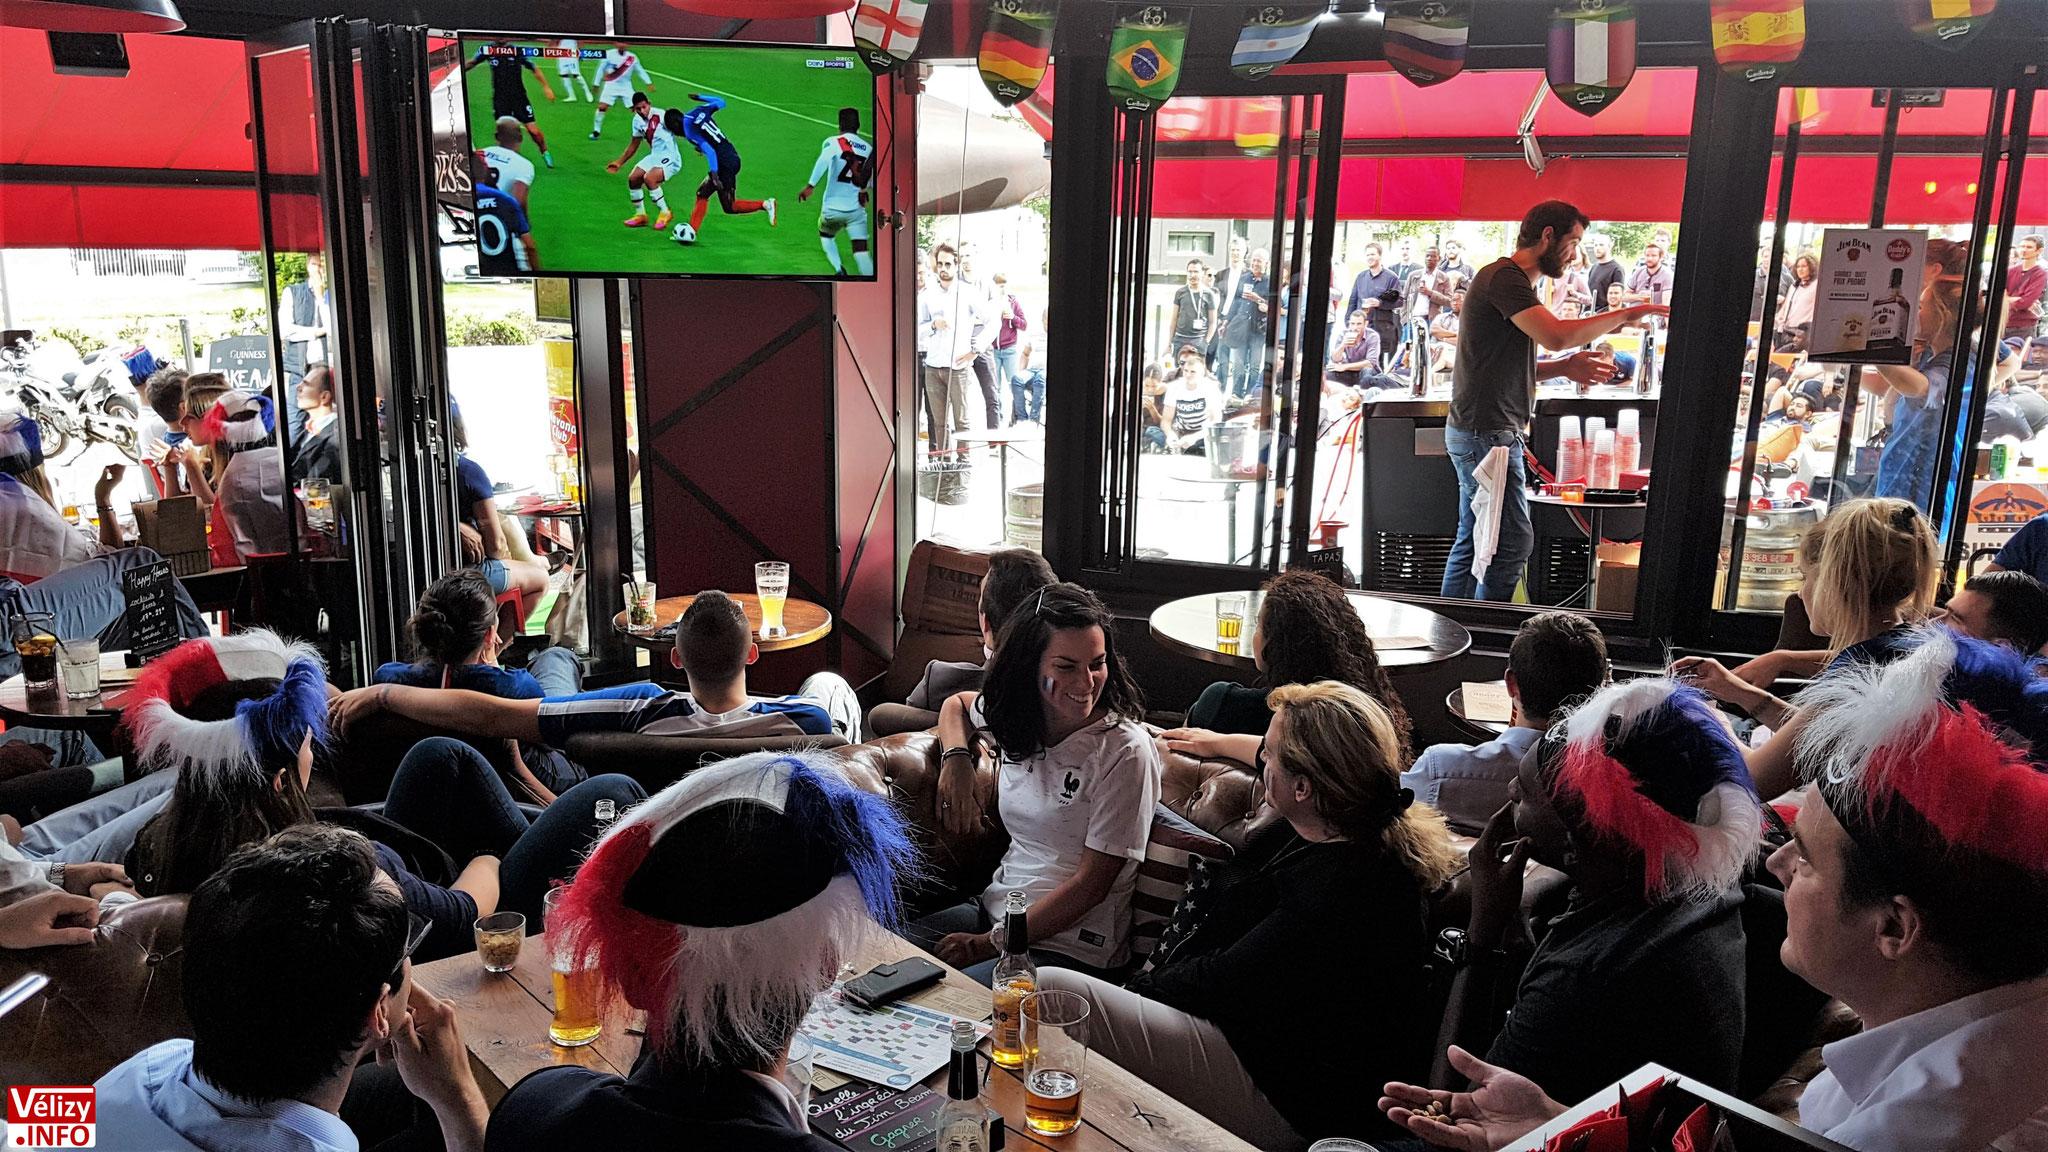 Doddy's Coffee Vélizy - Coupe du Monde de la FIFA, Russie 2018™